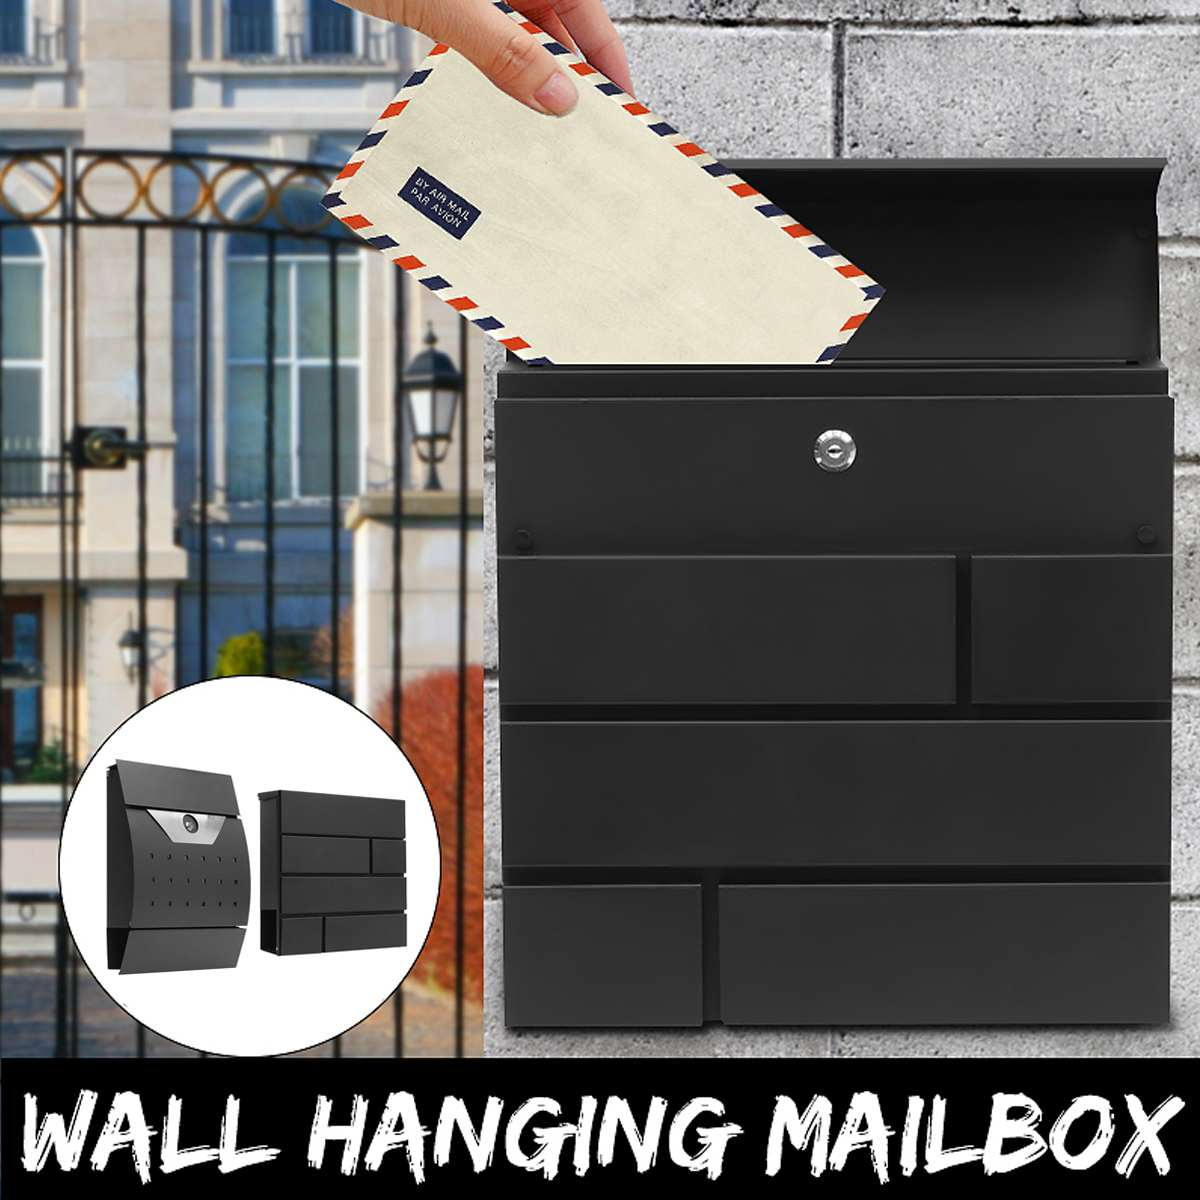 Modern Stainless Steel Mail Box Case Metal Newspaper Letter Mailbox Waterproof Post Box Lockable Box Garden Ornament